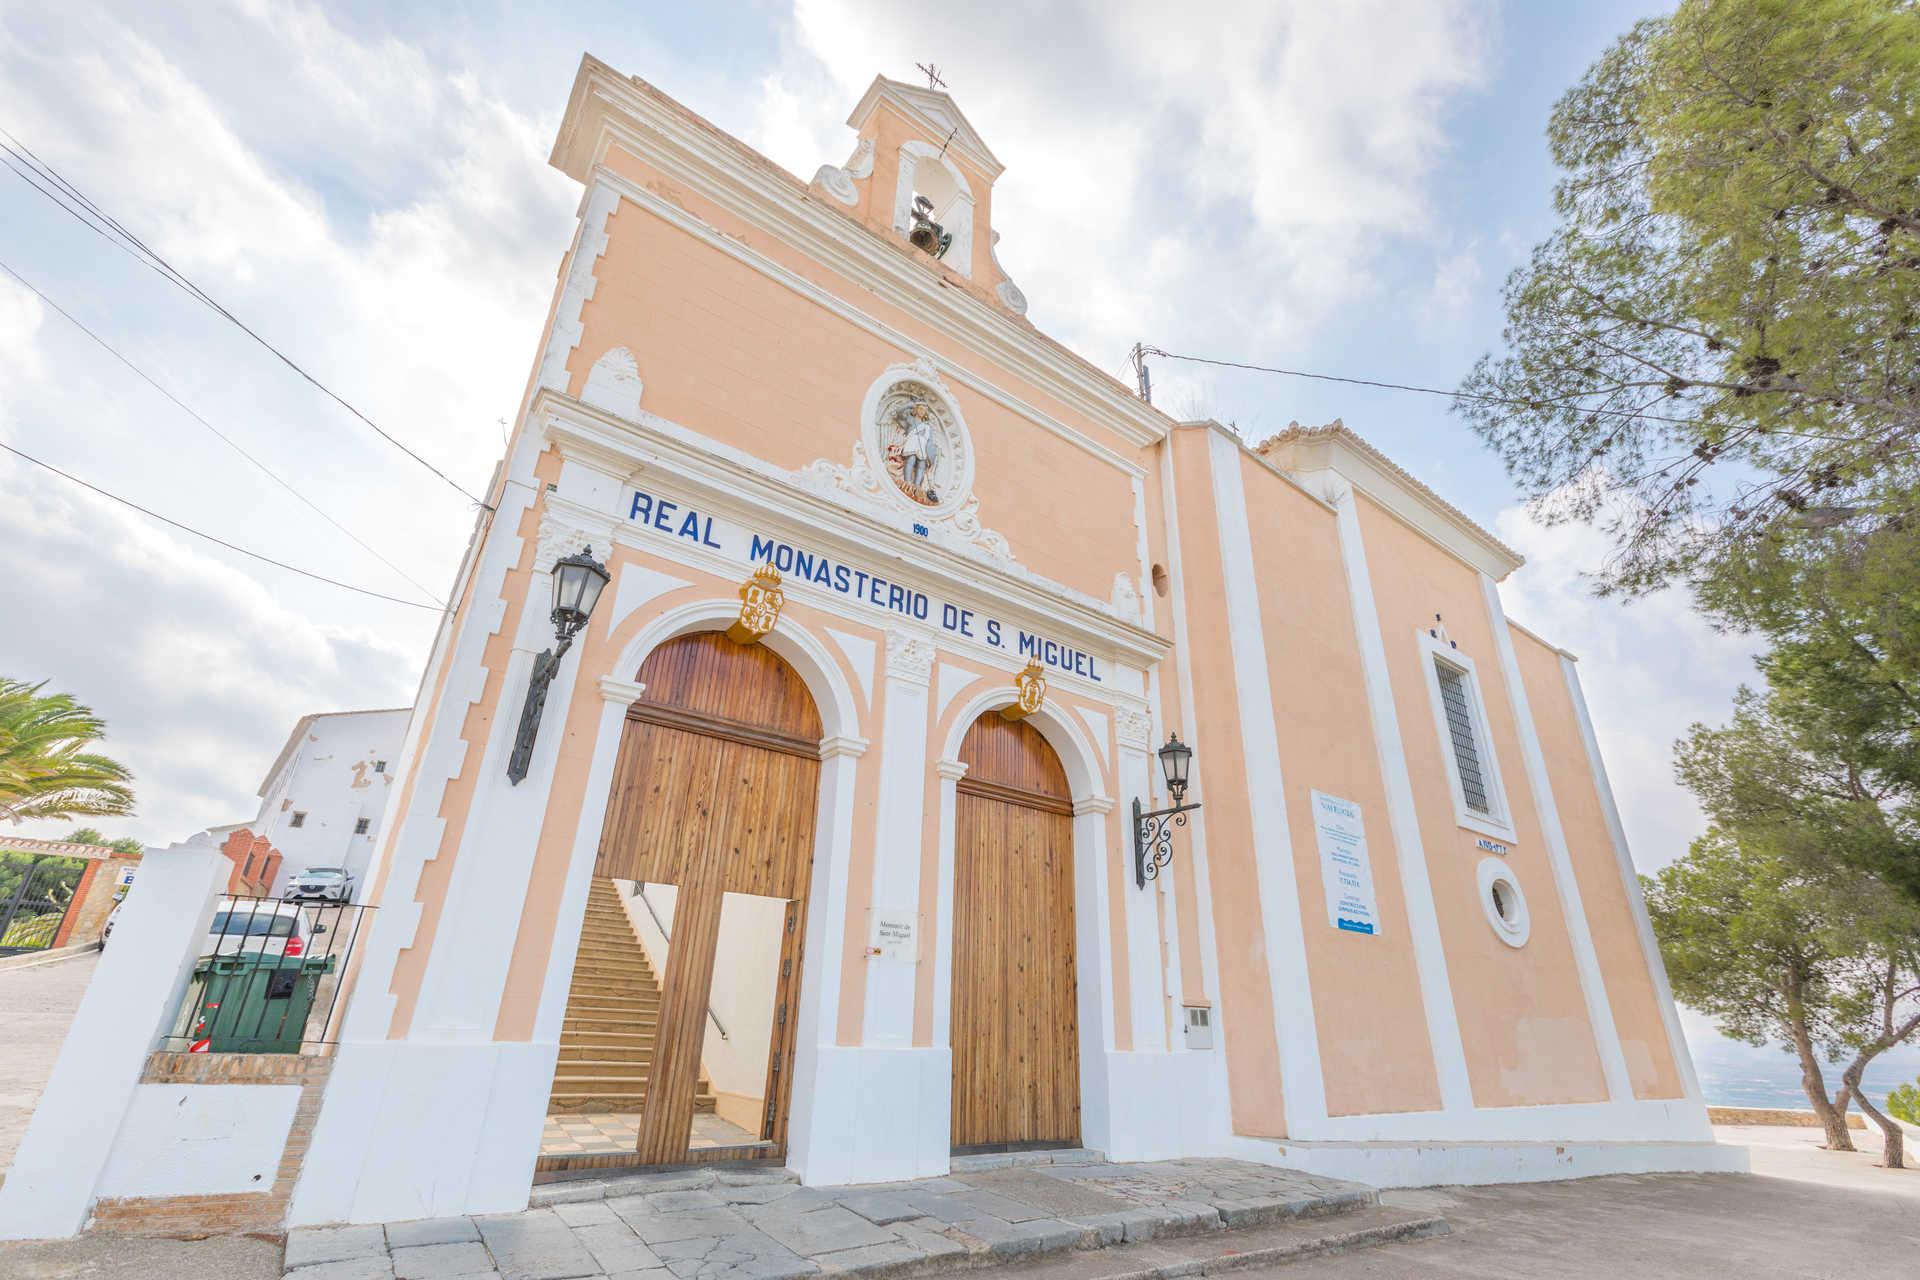 Monastère Royal San Miguel